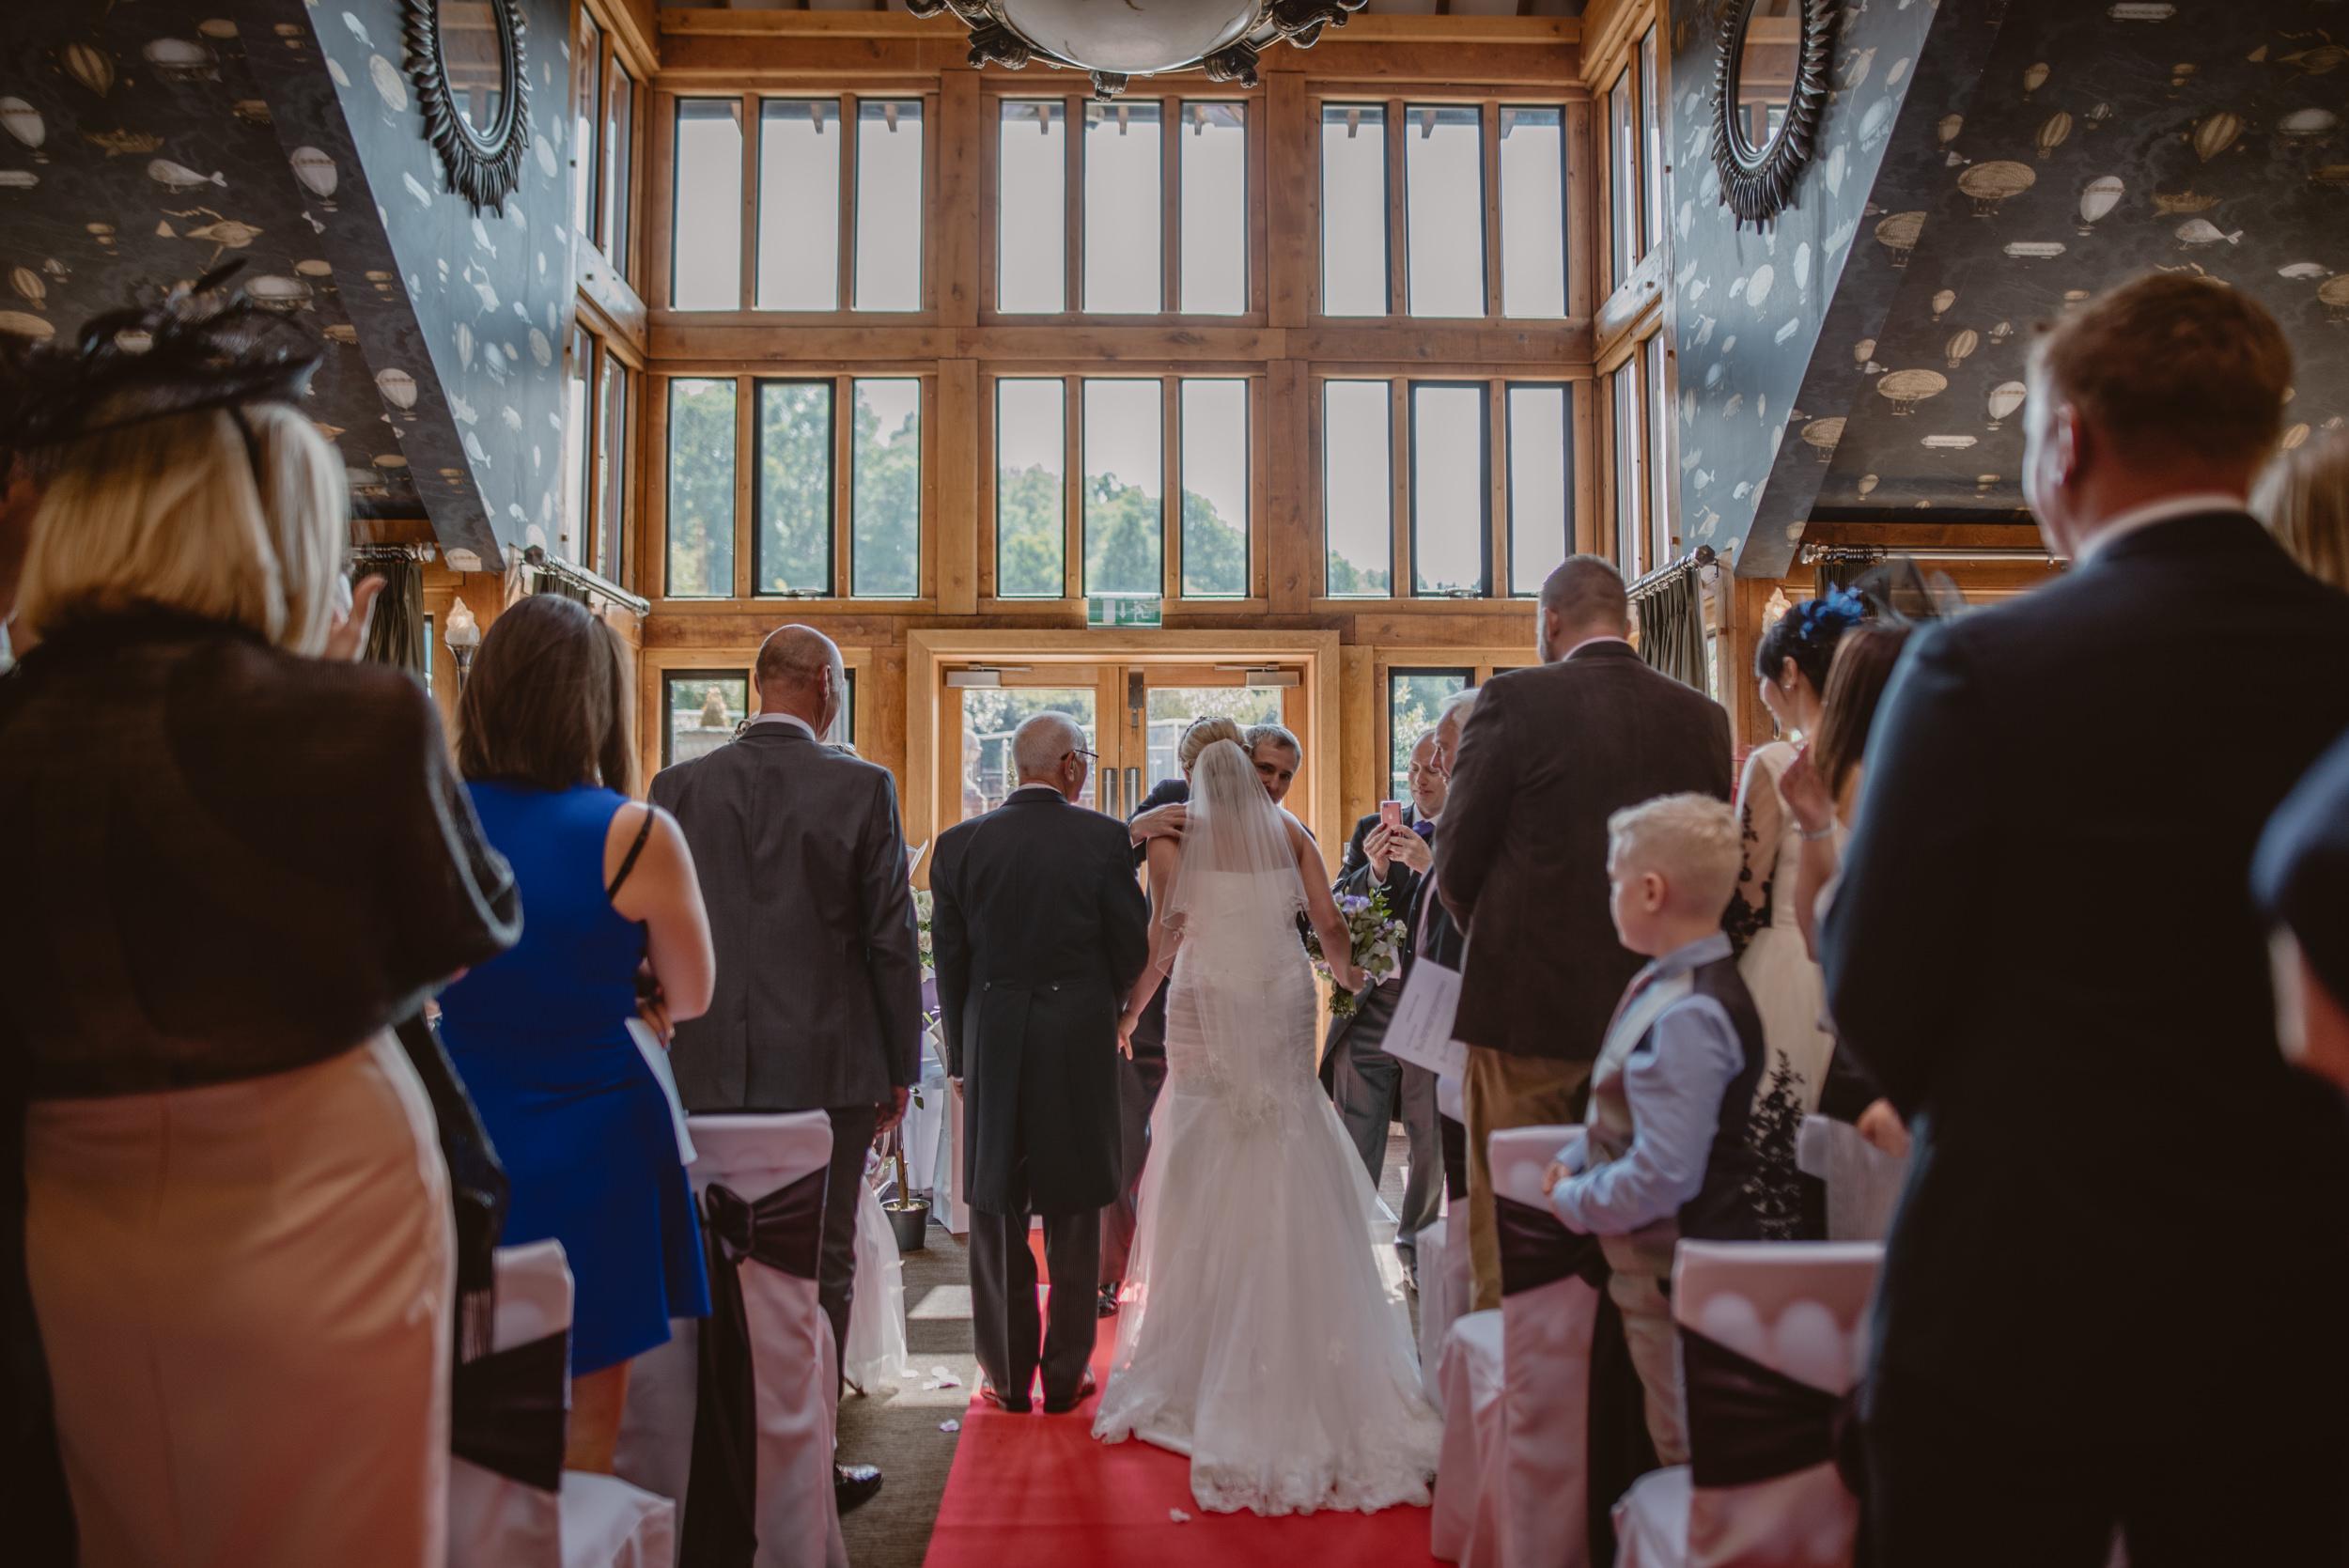 Chantelle-and-Stephen-Old-Thorns-Hotel-Wedding-Liphook-Manu-Mendoza-Wedding-Photography-183.jpg